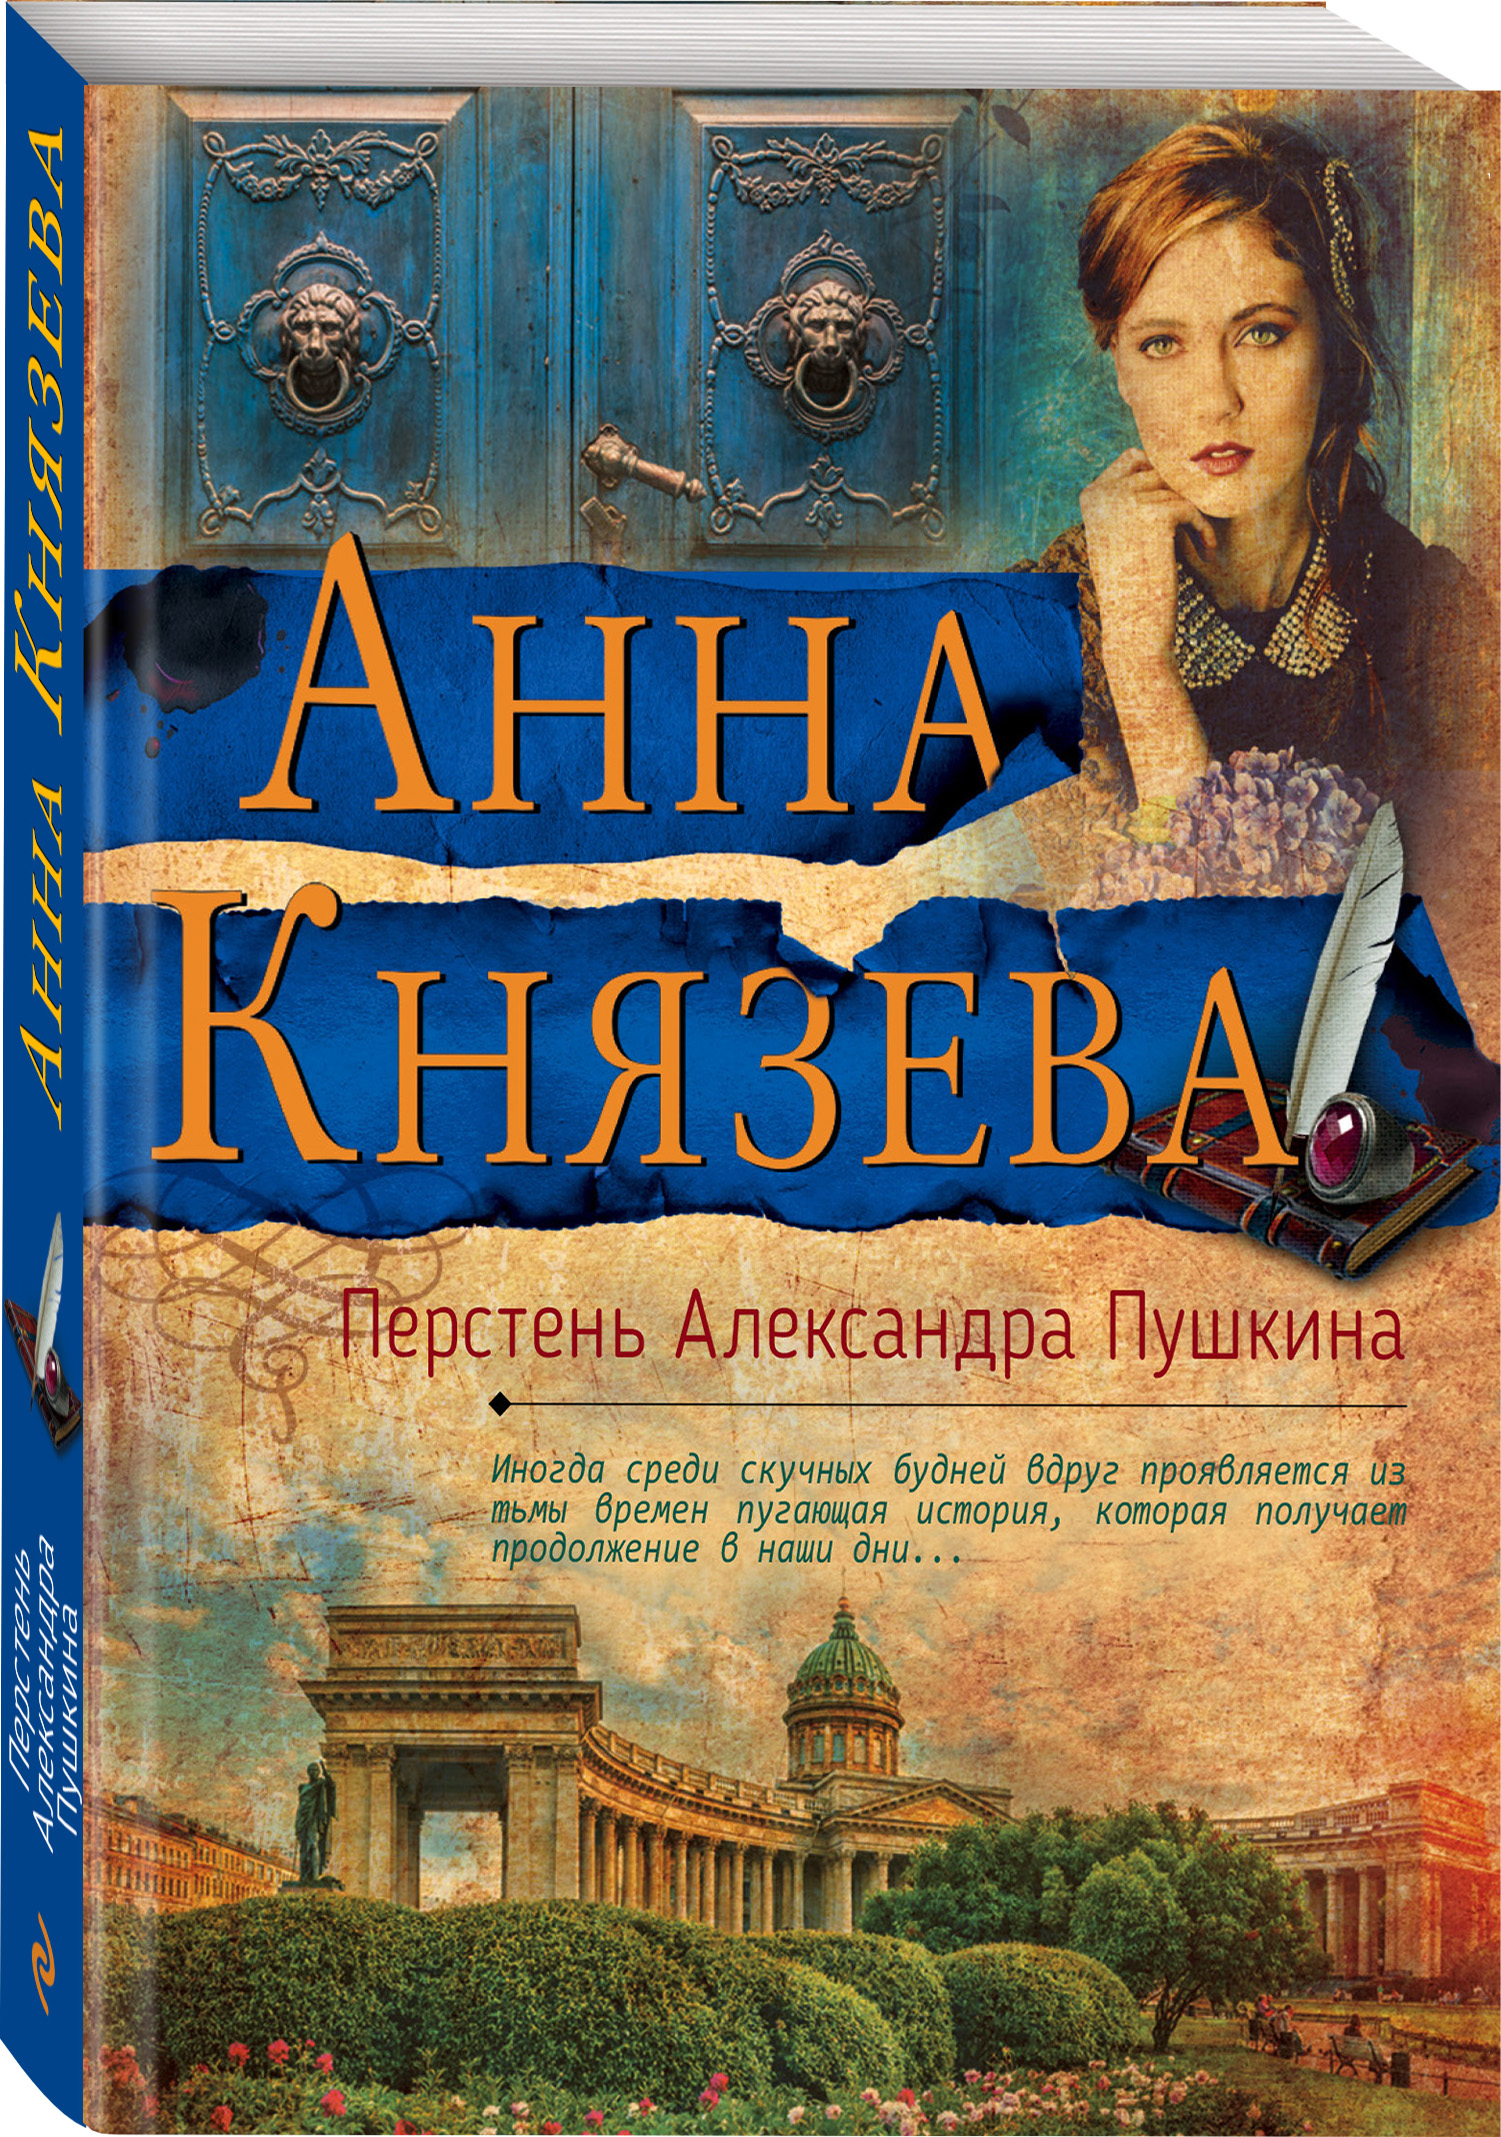 Перстень Александра Пушкина